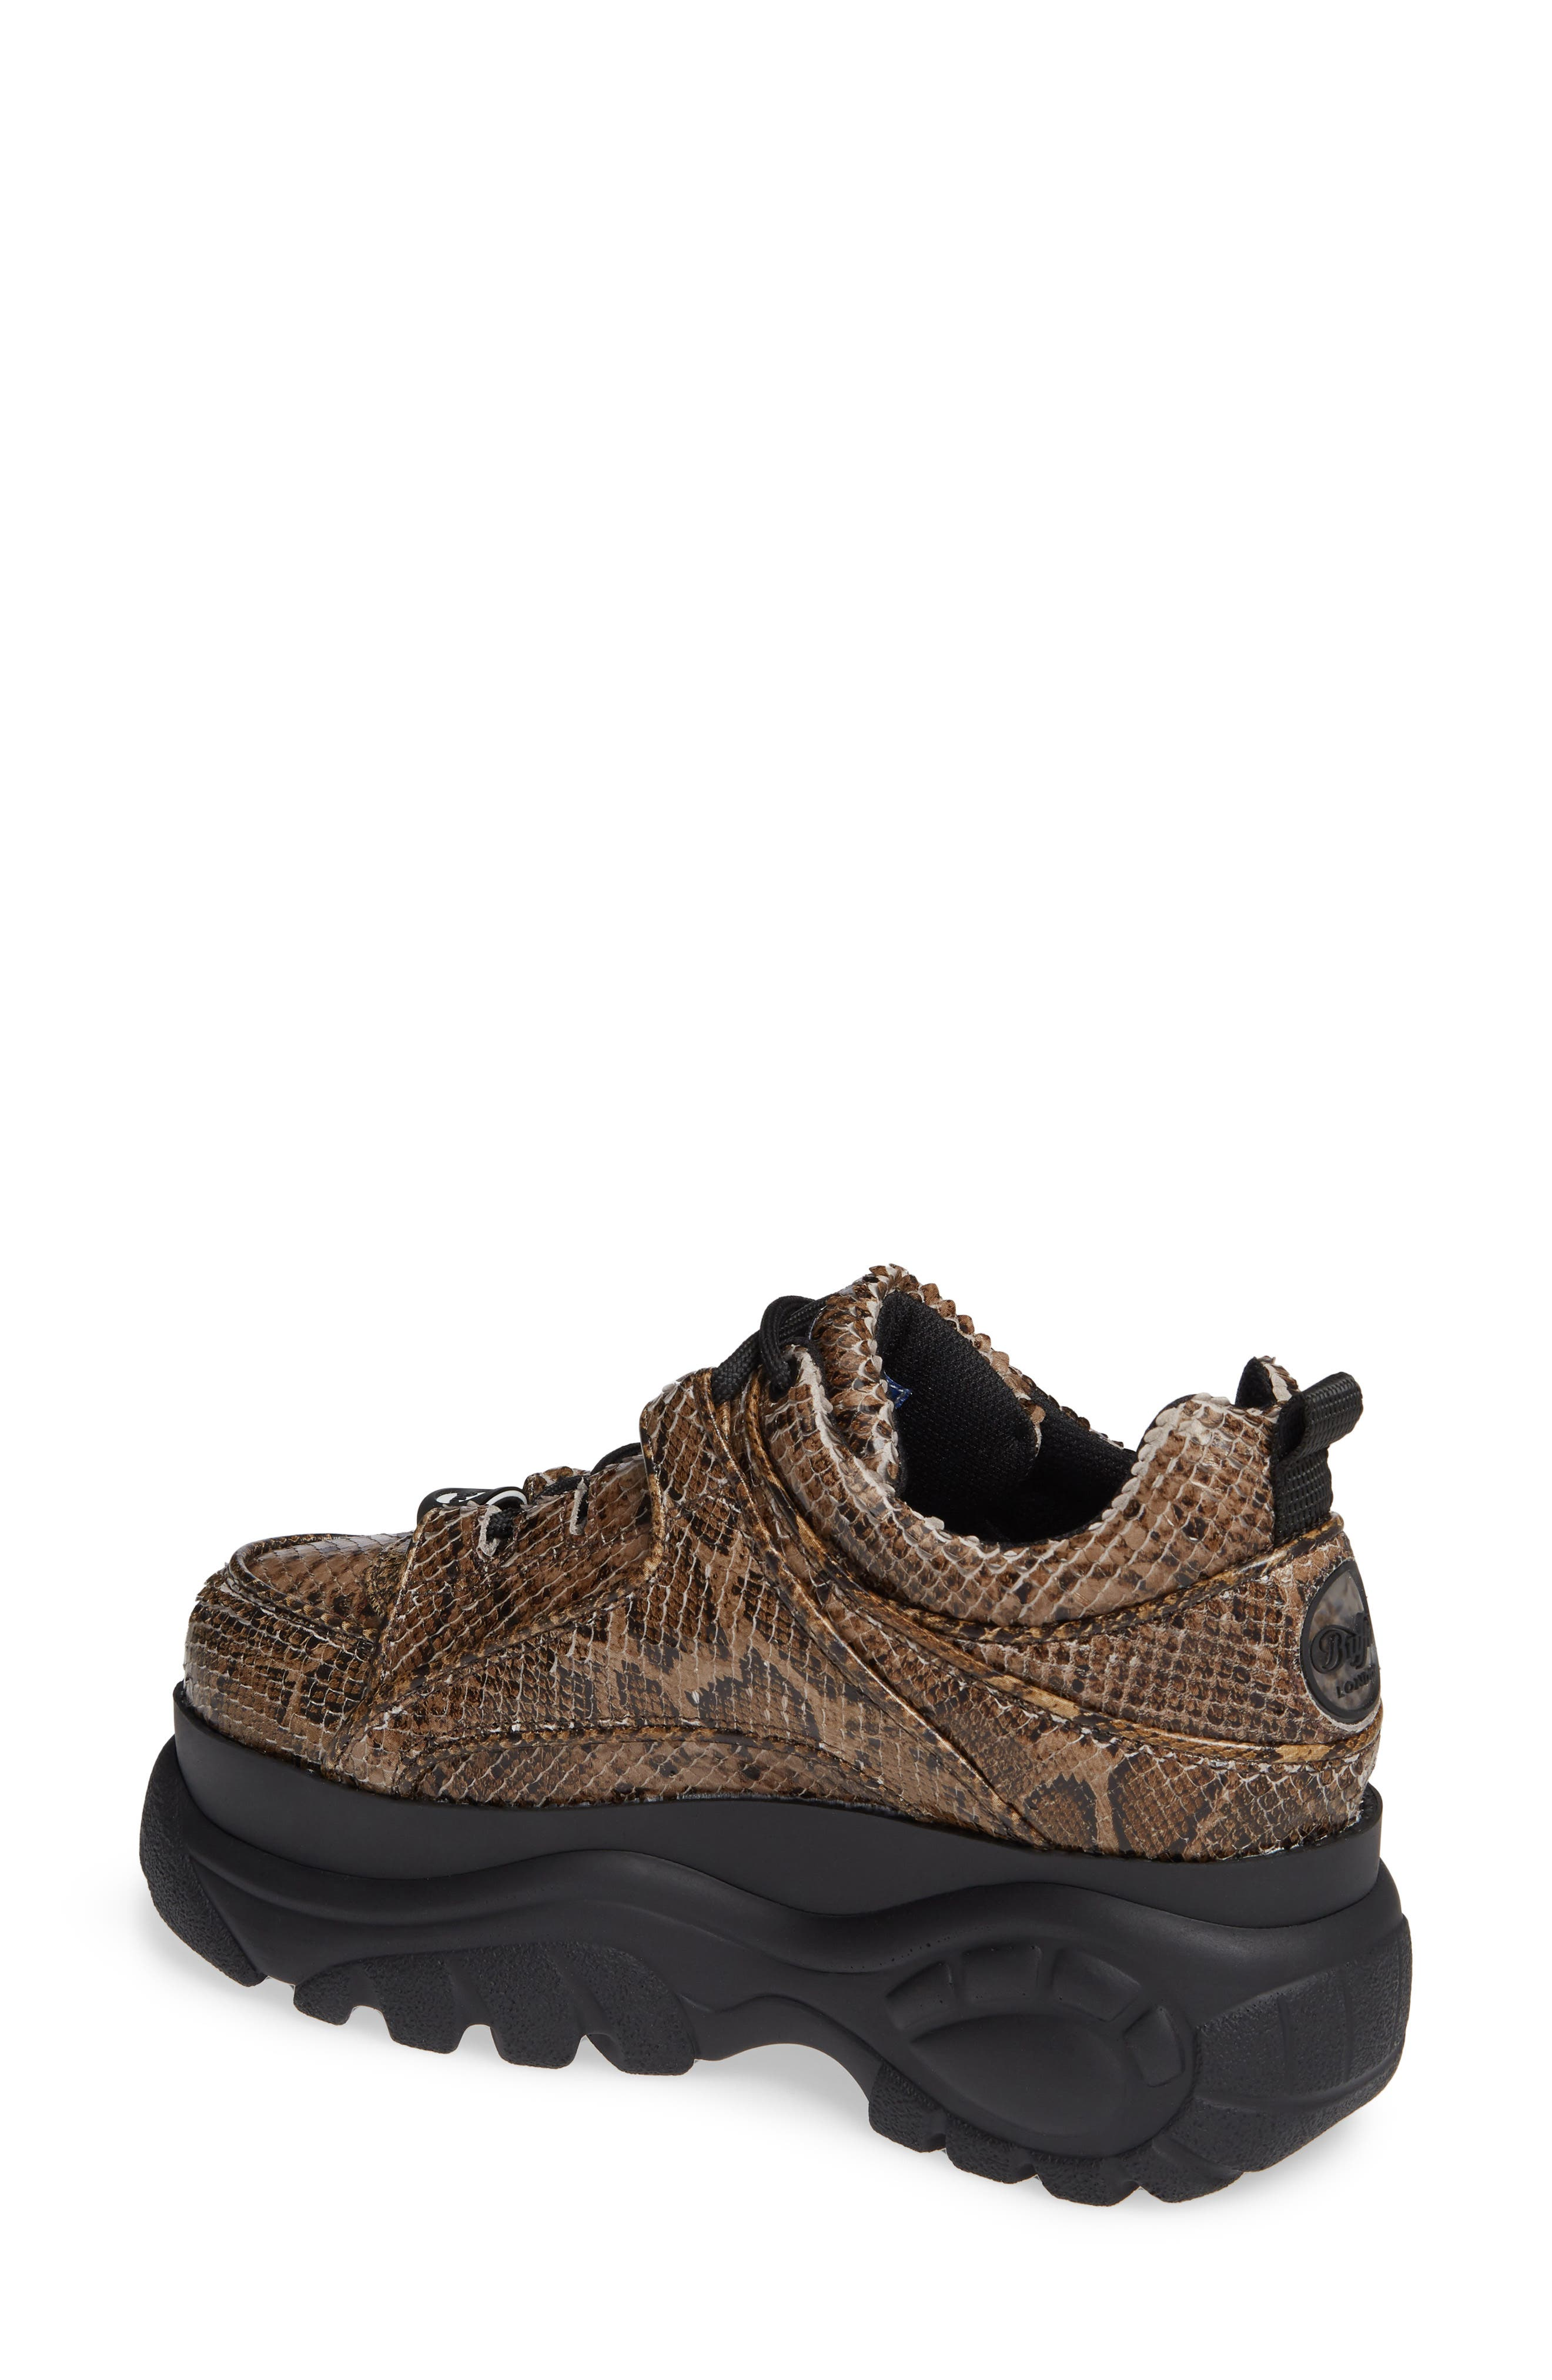 x Buffalo London Python Print Platform Sneaker,                             Alternate thumbnail 2, color,                             BEIGE